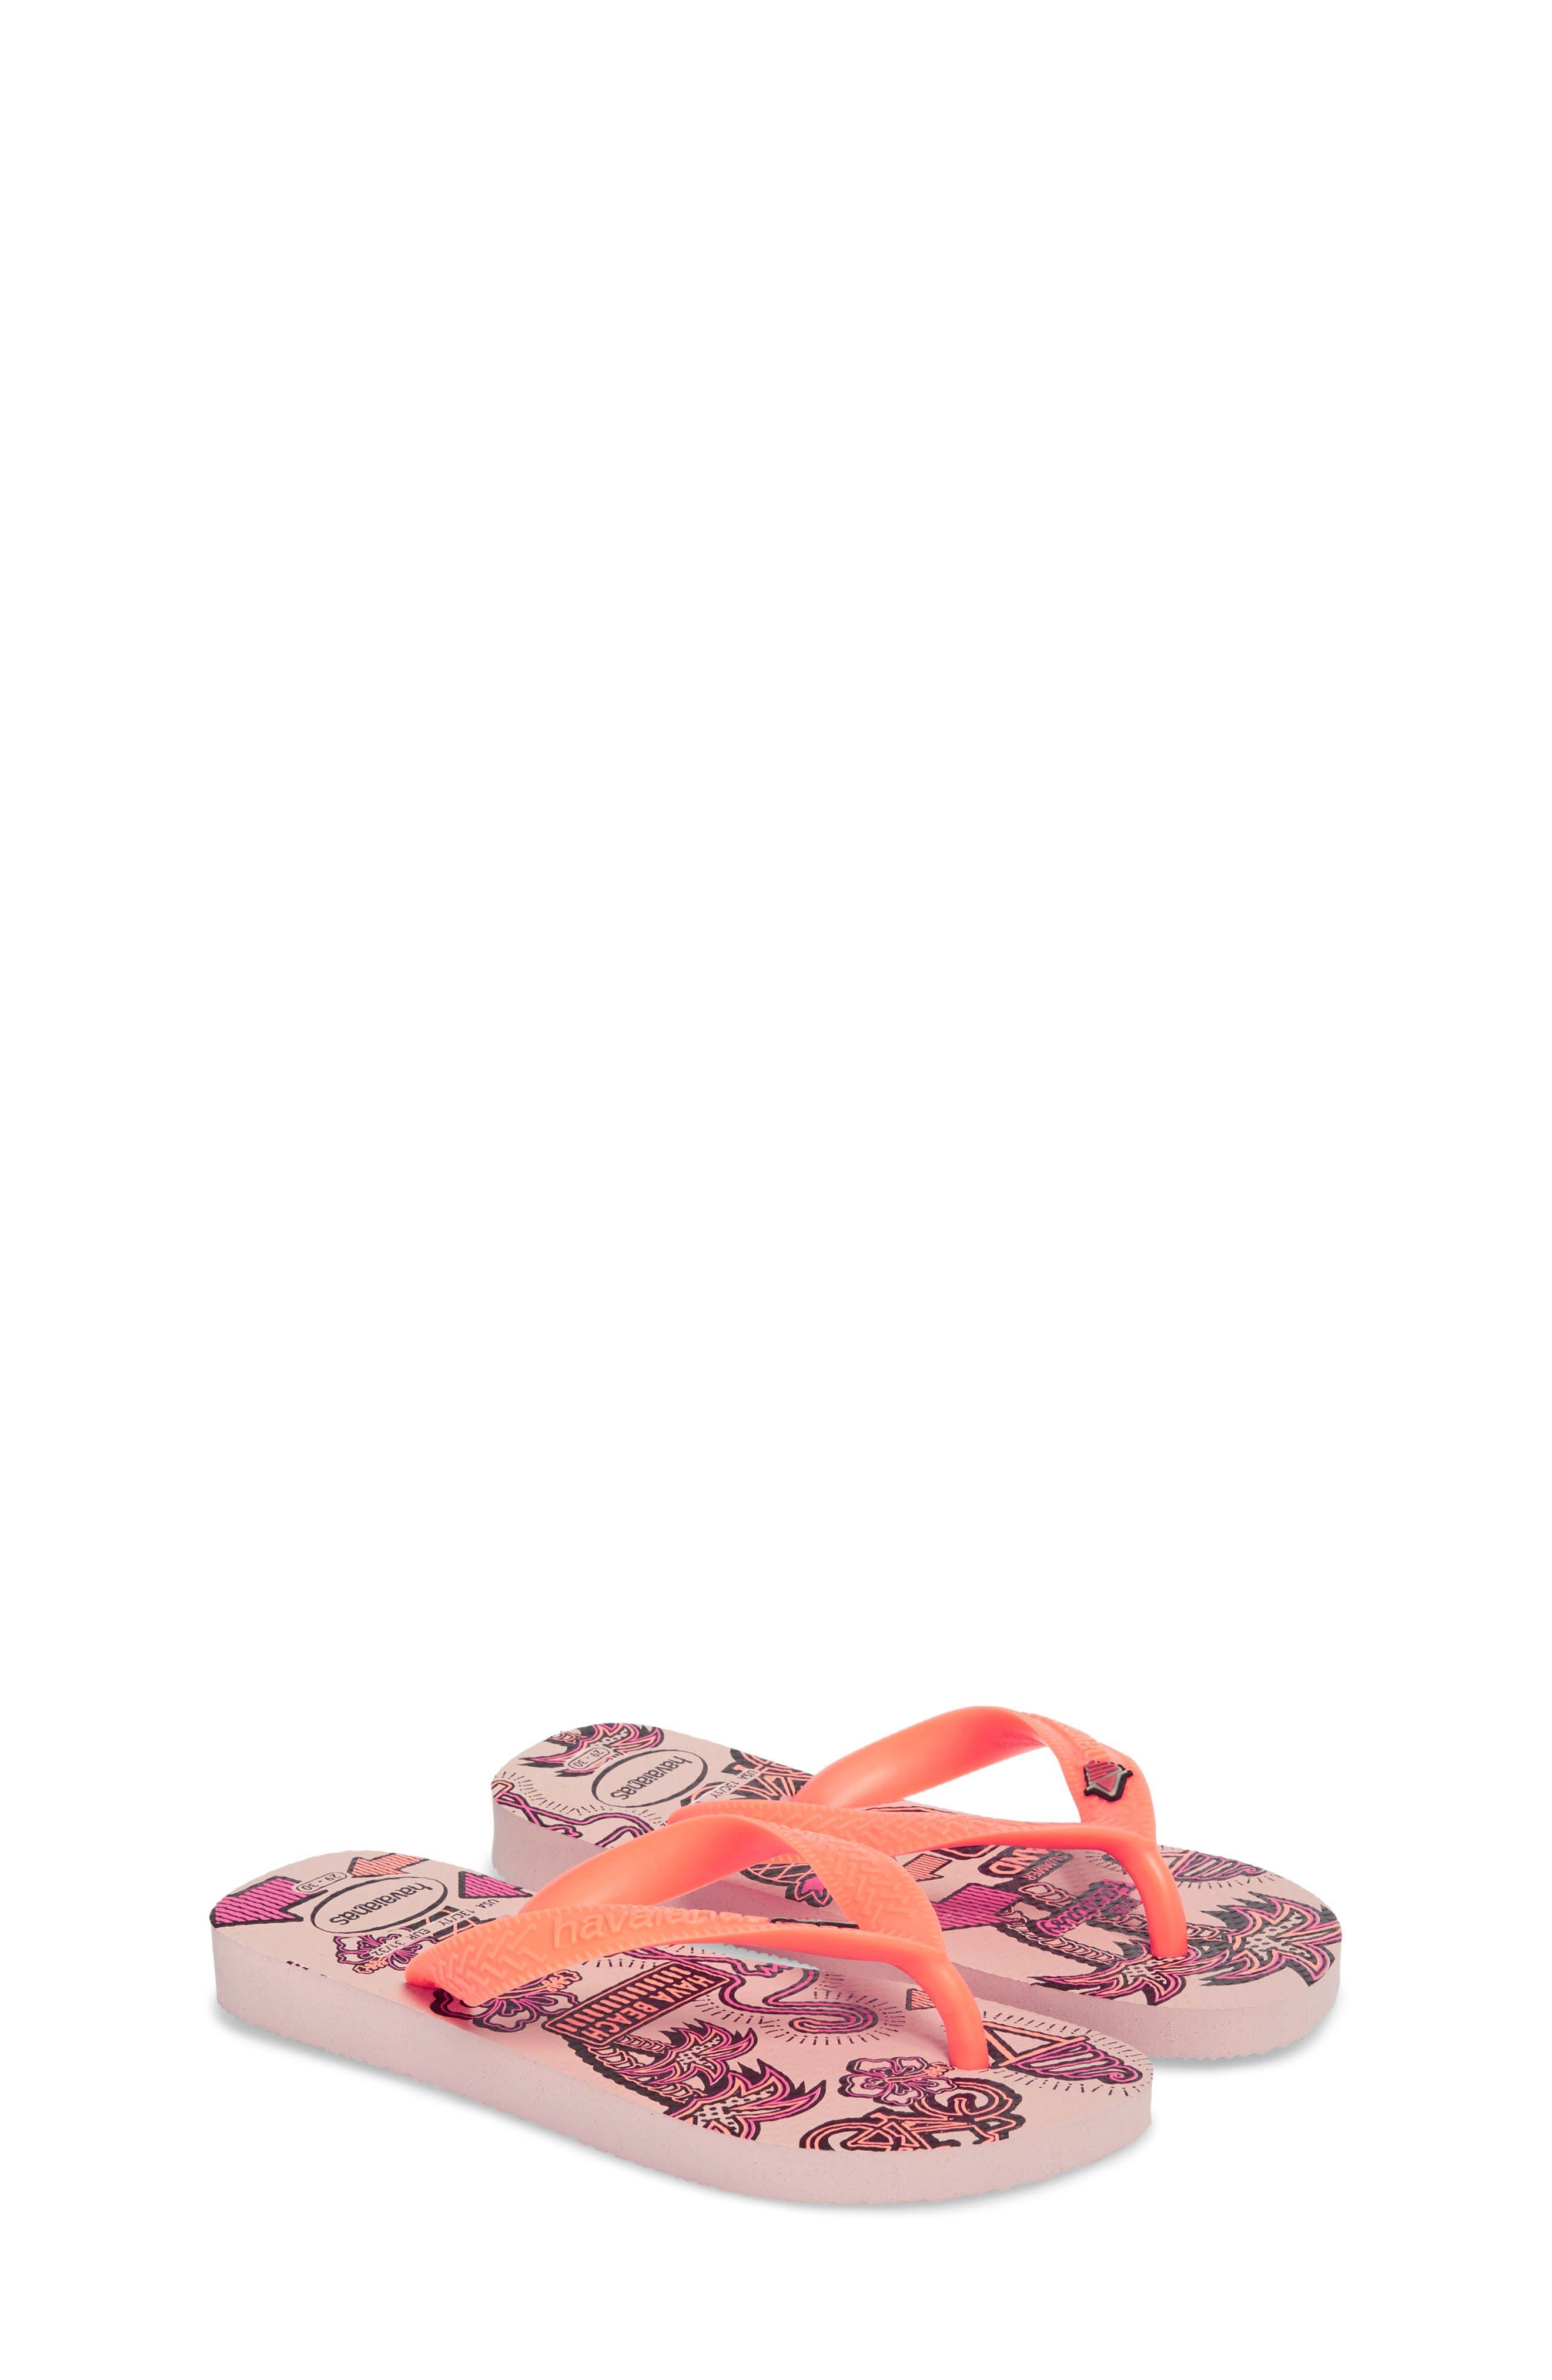 Havianas Fantasy Flip Flop,                             Alternate thumbnail 3, color,                             Pearl Pink